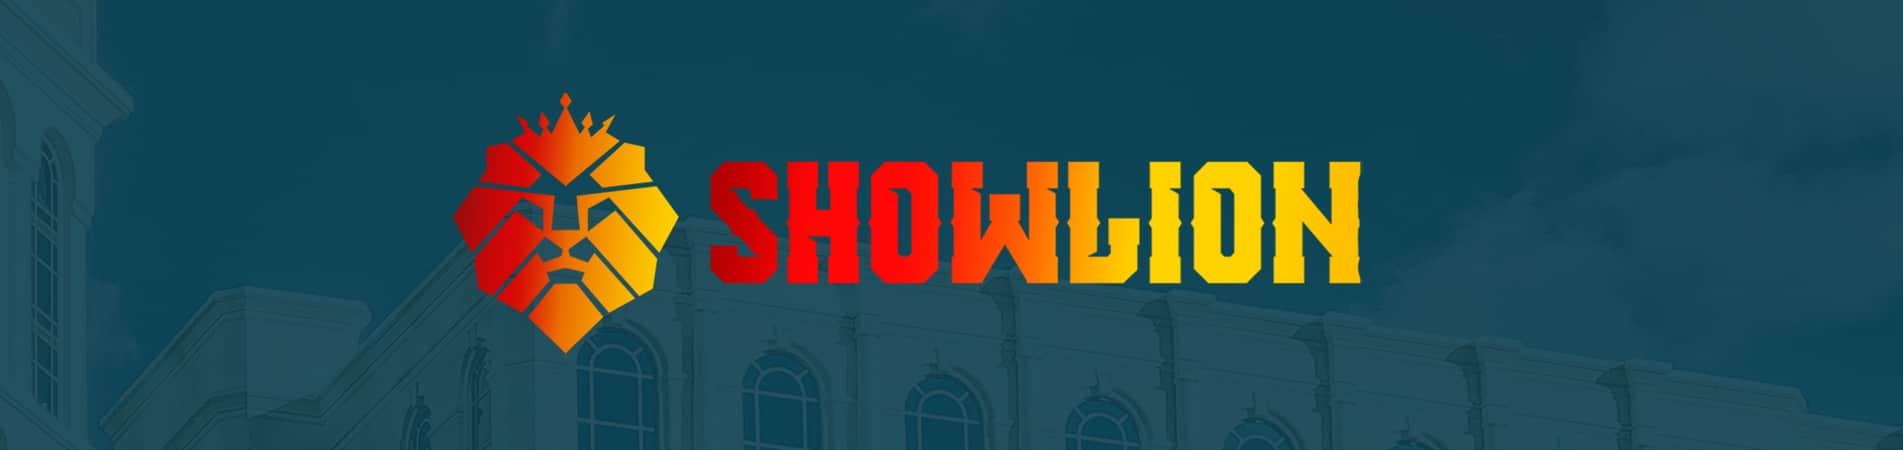 Showlion Banner Logo